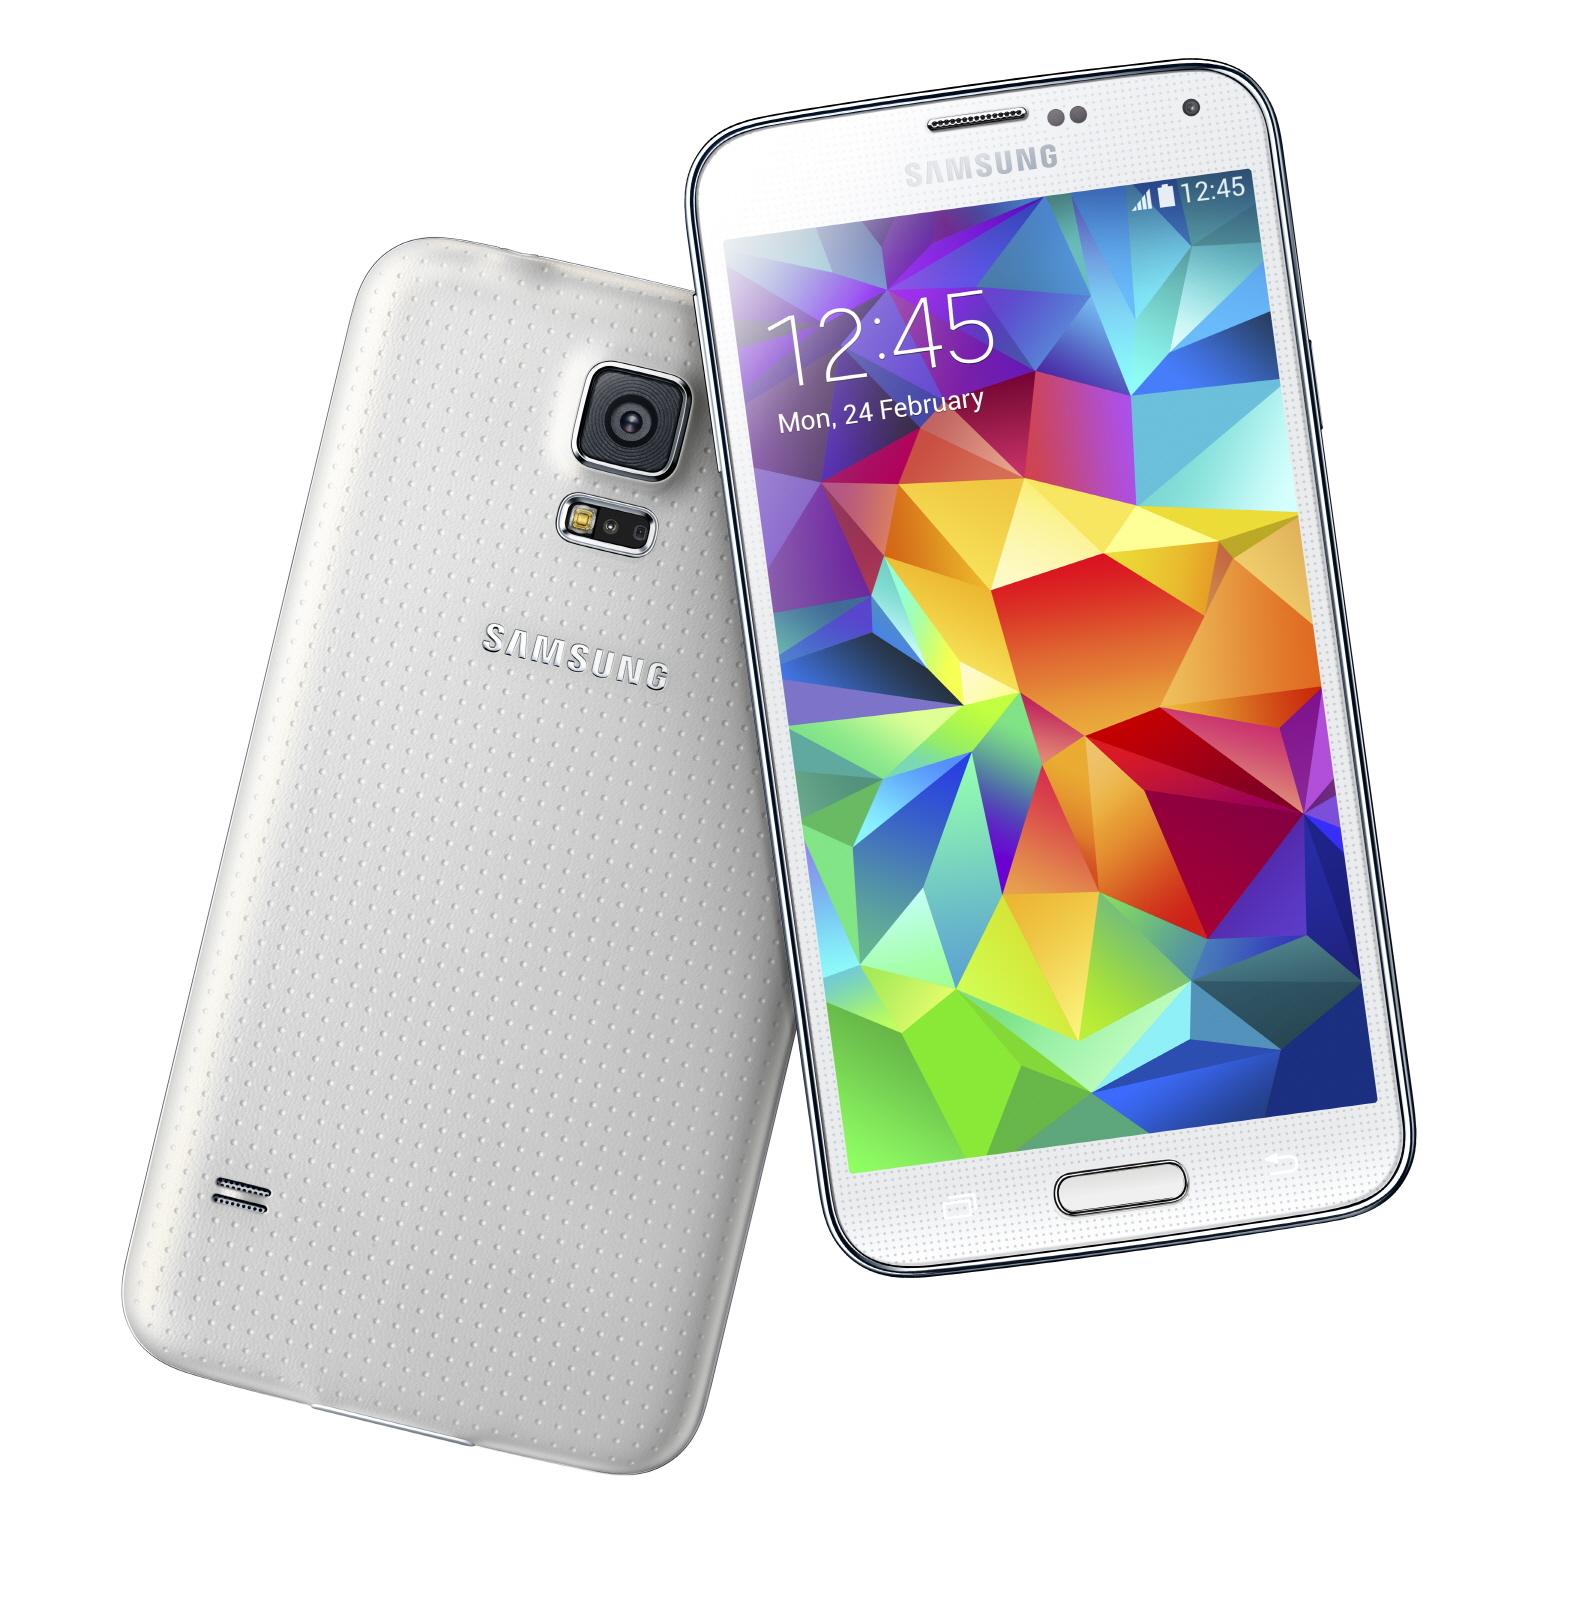 Samsung anuncia Galaxy S5 no Brasil por R$ 2.599 - Tecnoblog